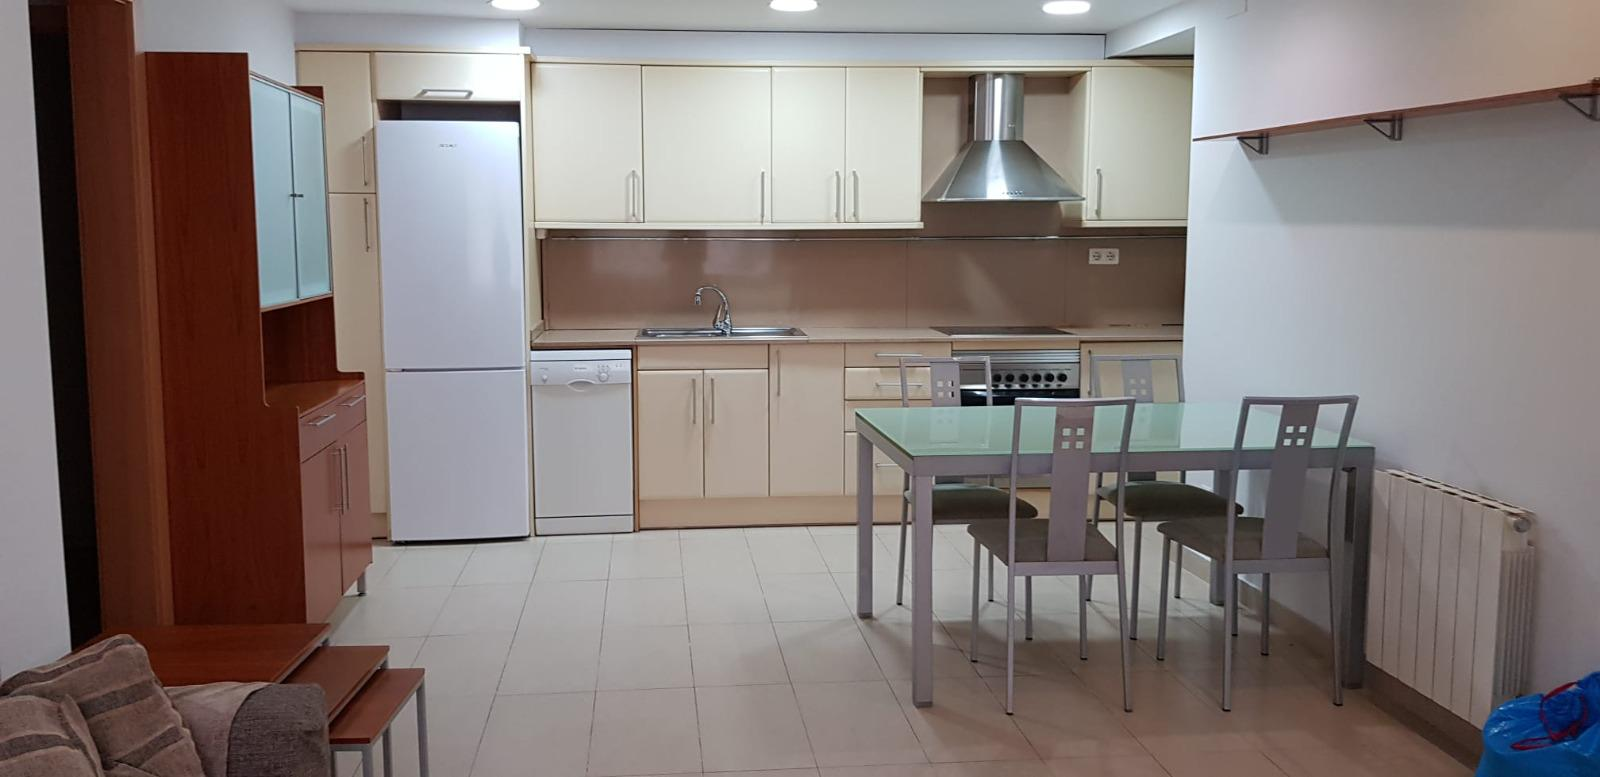 Imagen 1 Piso en venta en Canovelles / Canovelles-Plaza Juventud-Seminuevo-Amueblado